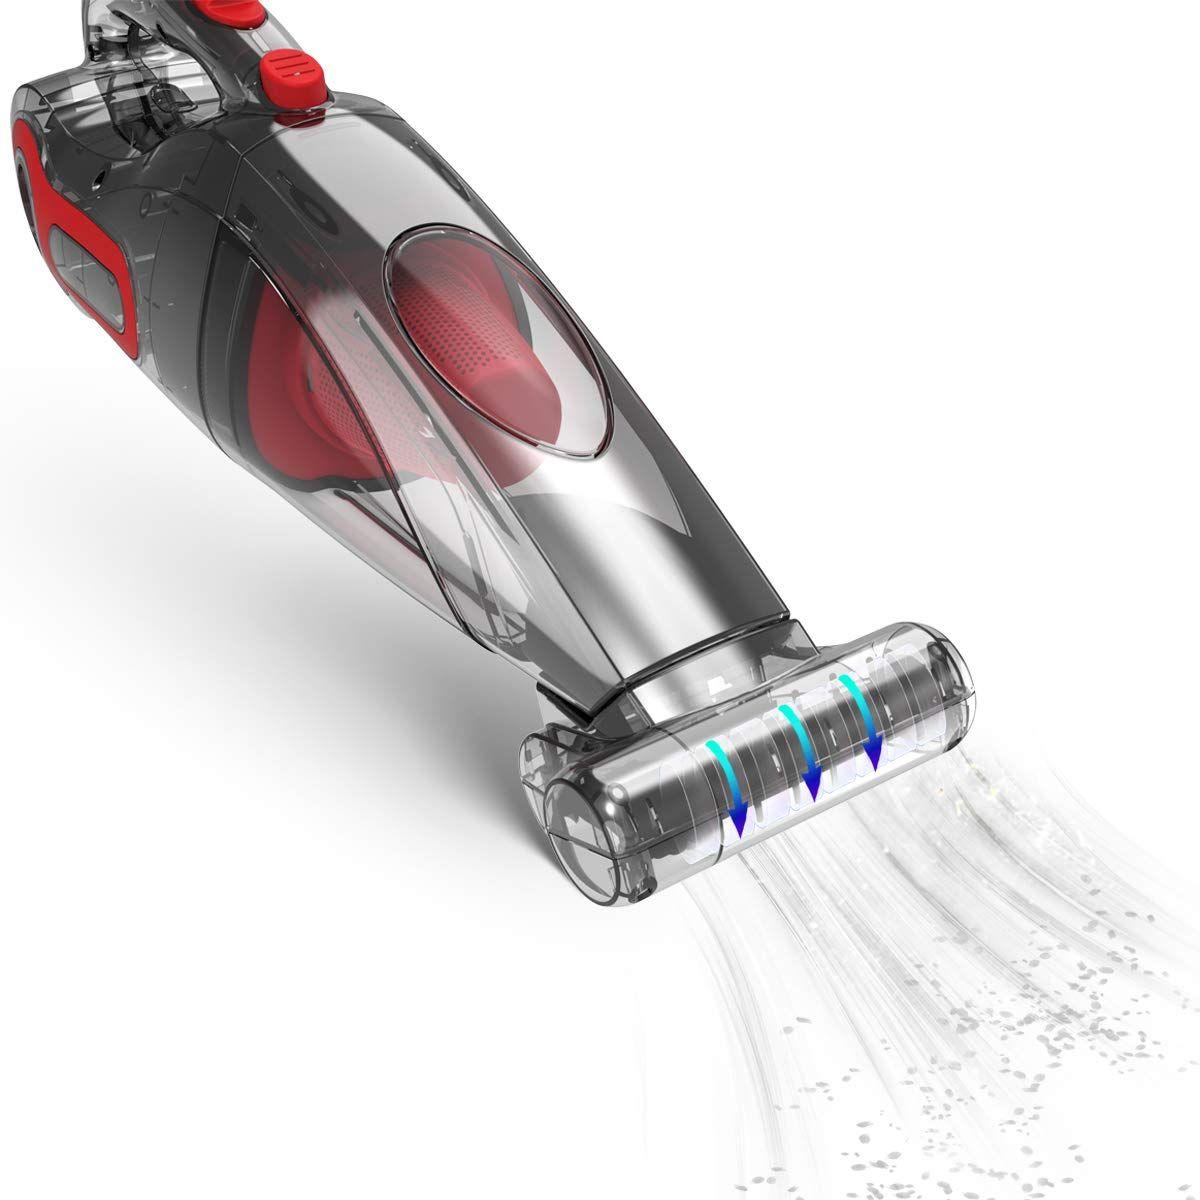 Dibea handheld cordless vacuum cleaner bx350 review